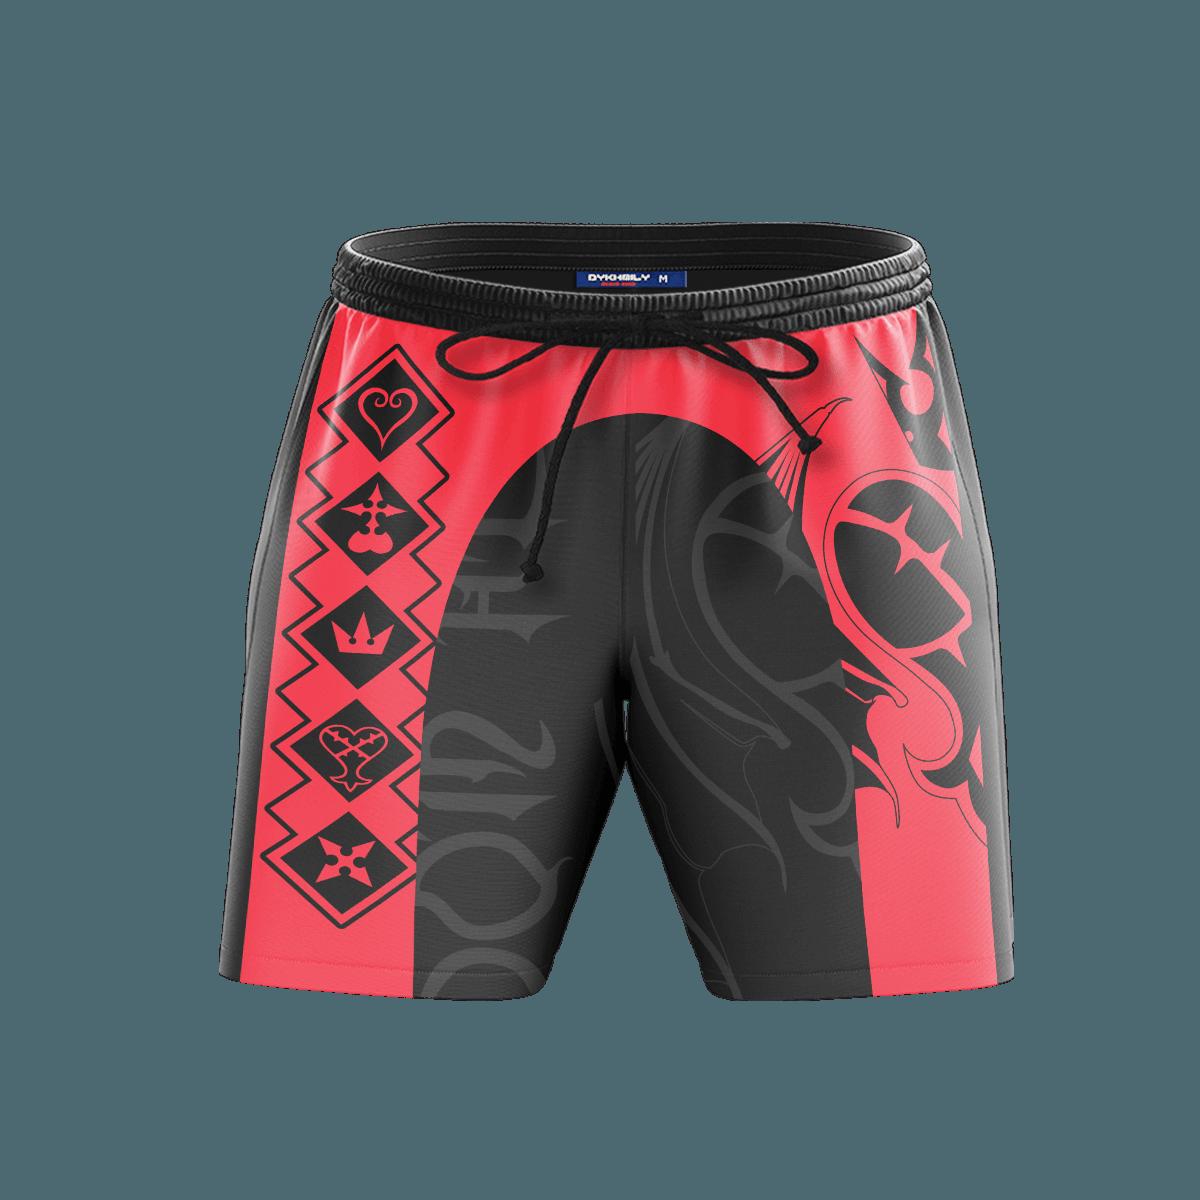 KH Black Heart Beach Shorts FDM3107 S Official Anime Swimsuit Merch